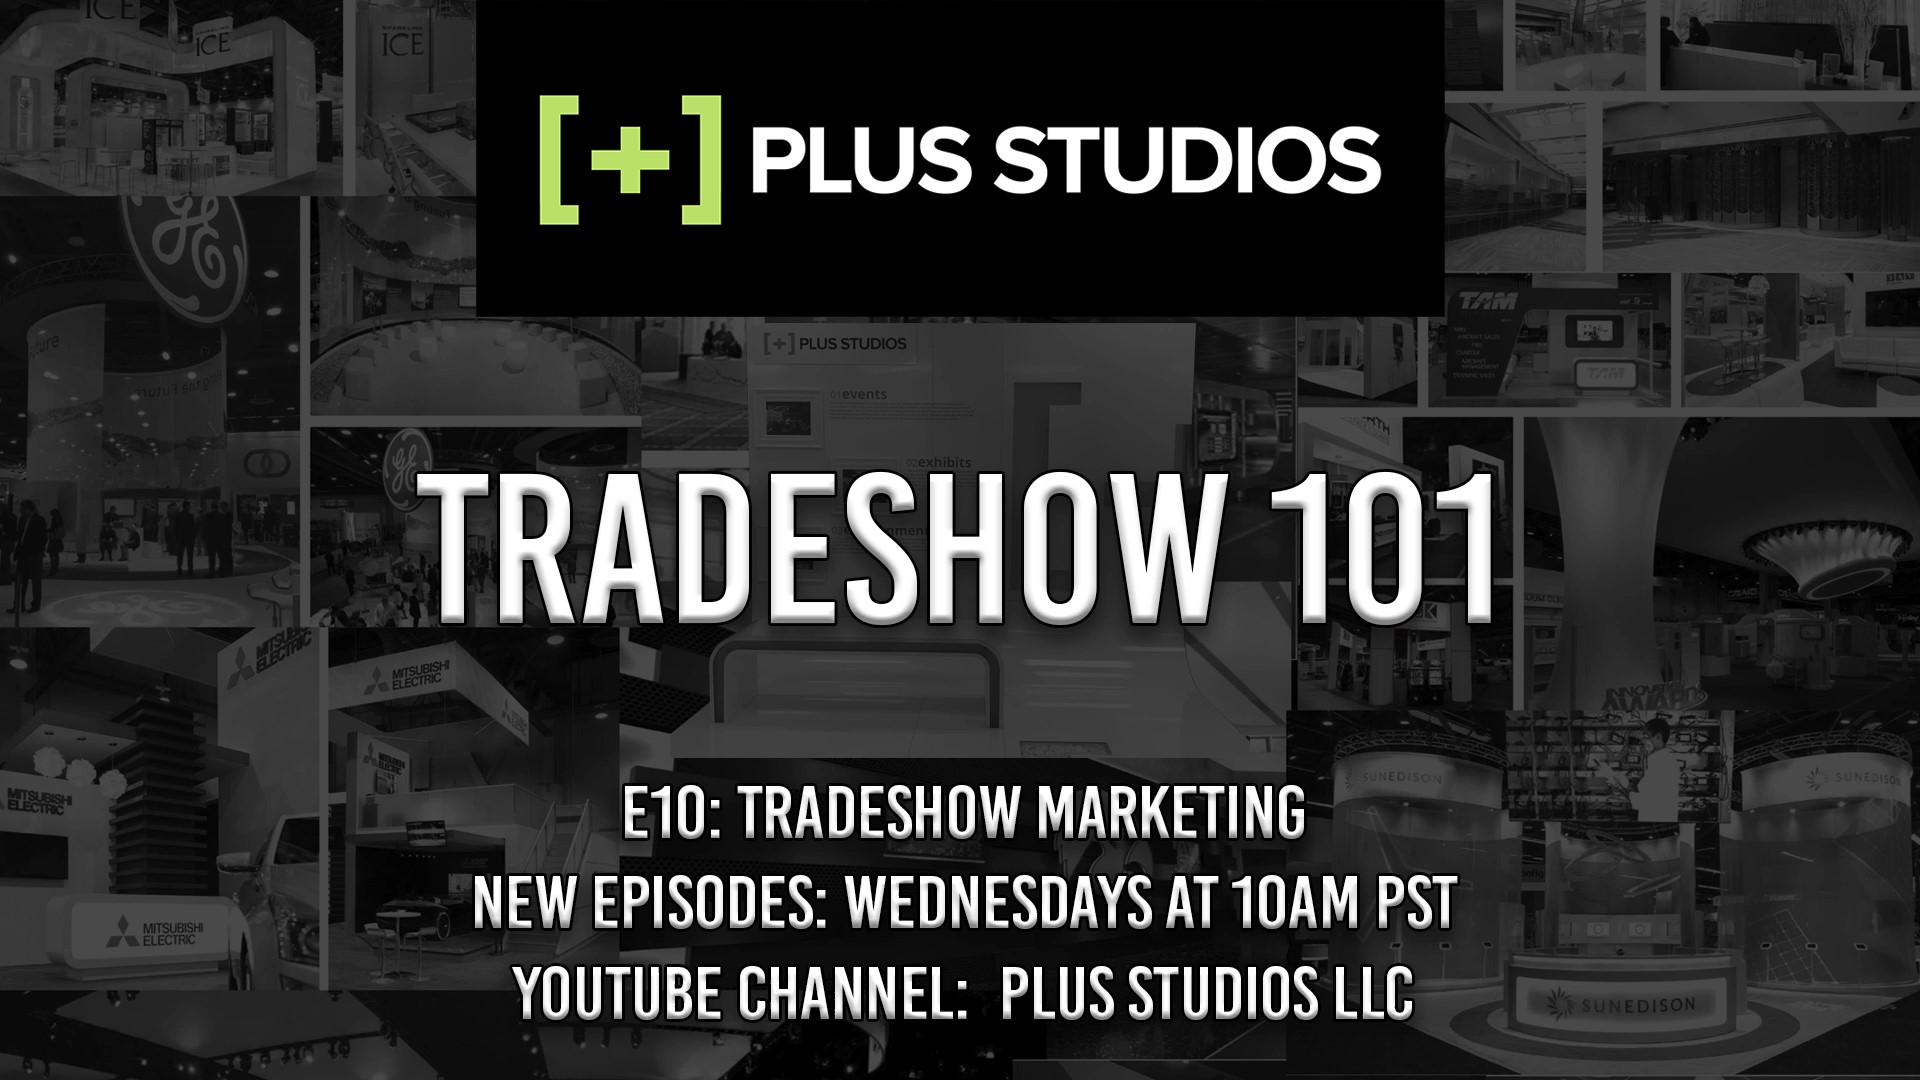 Tradeshow 101 : E10 – Let's Talk Trade Show Marketing